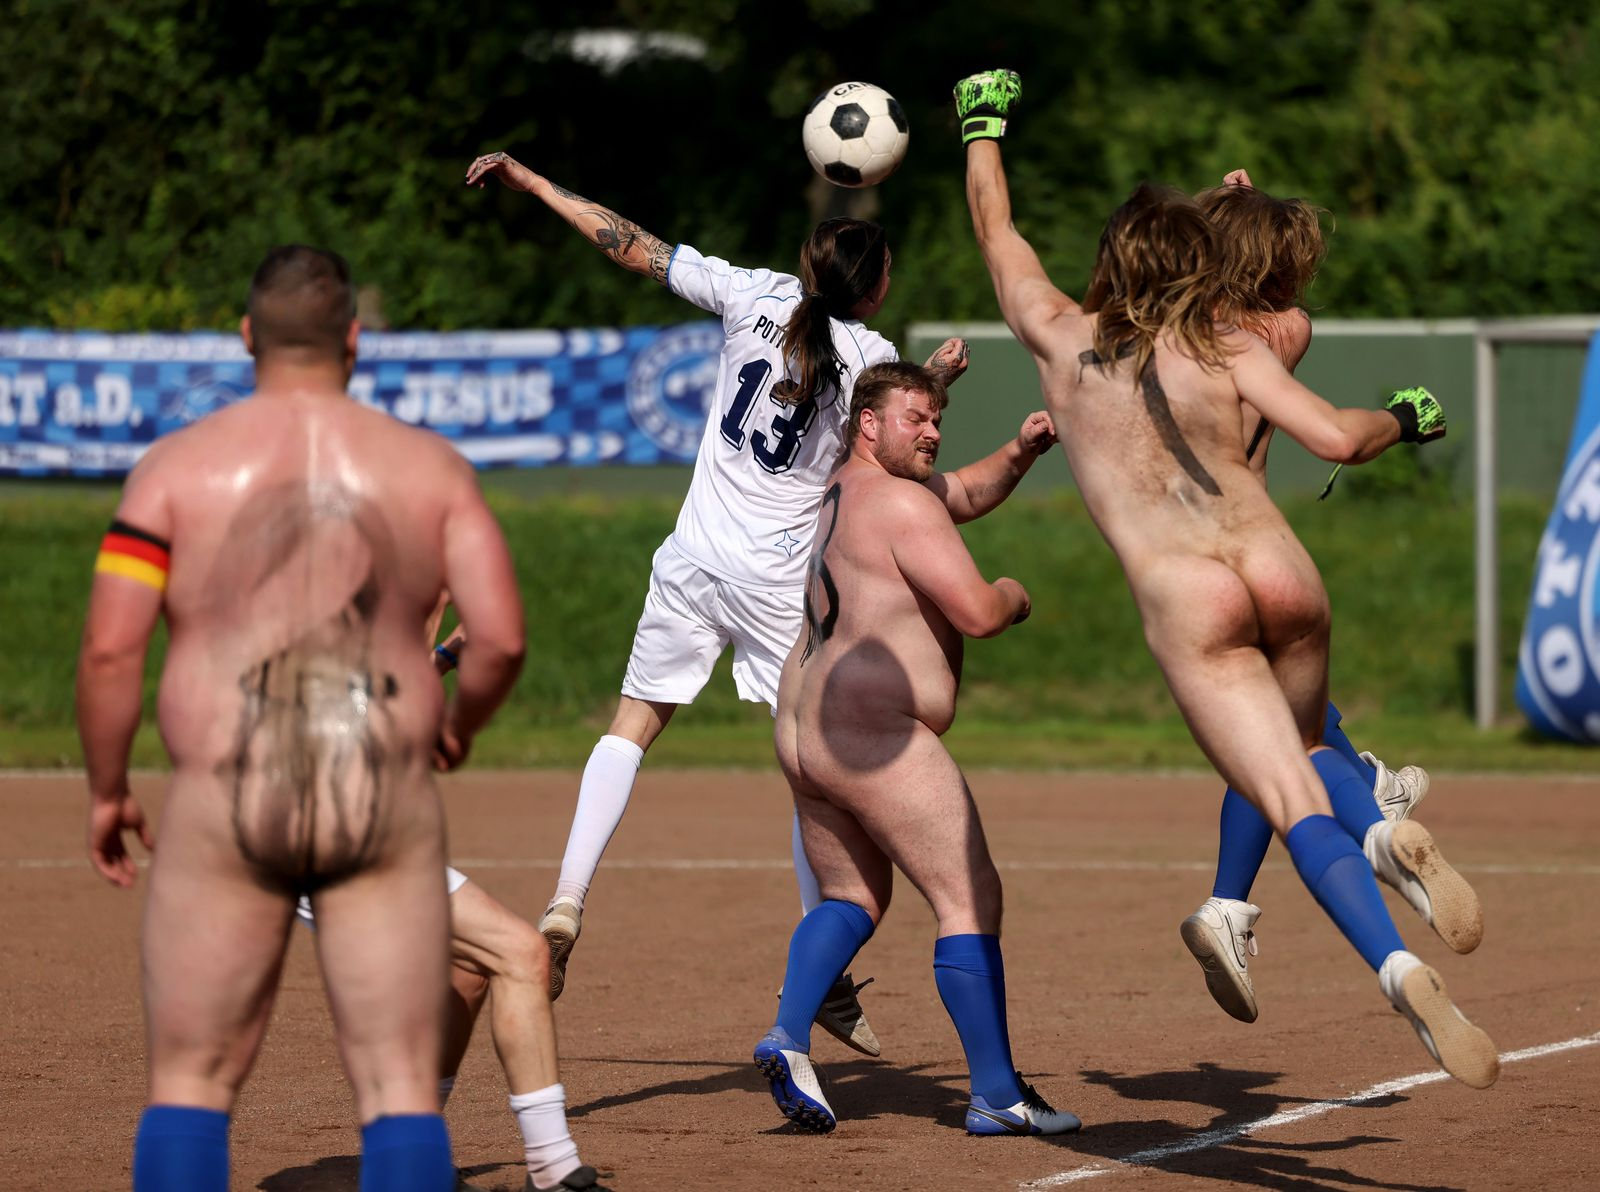 Kunstaktion - Fußball-NACKTionalmannschaft